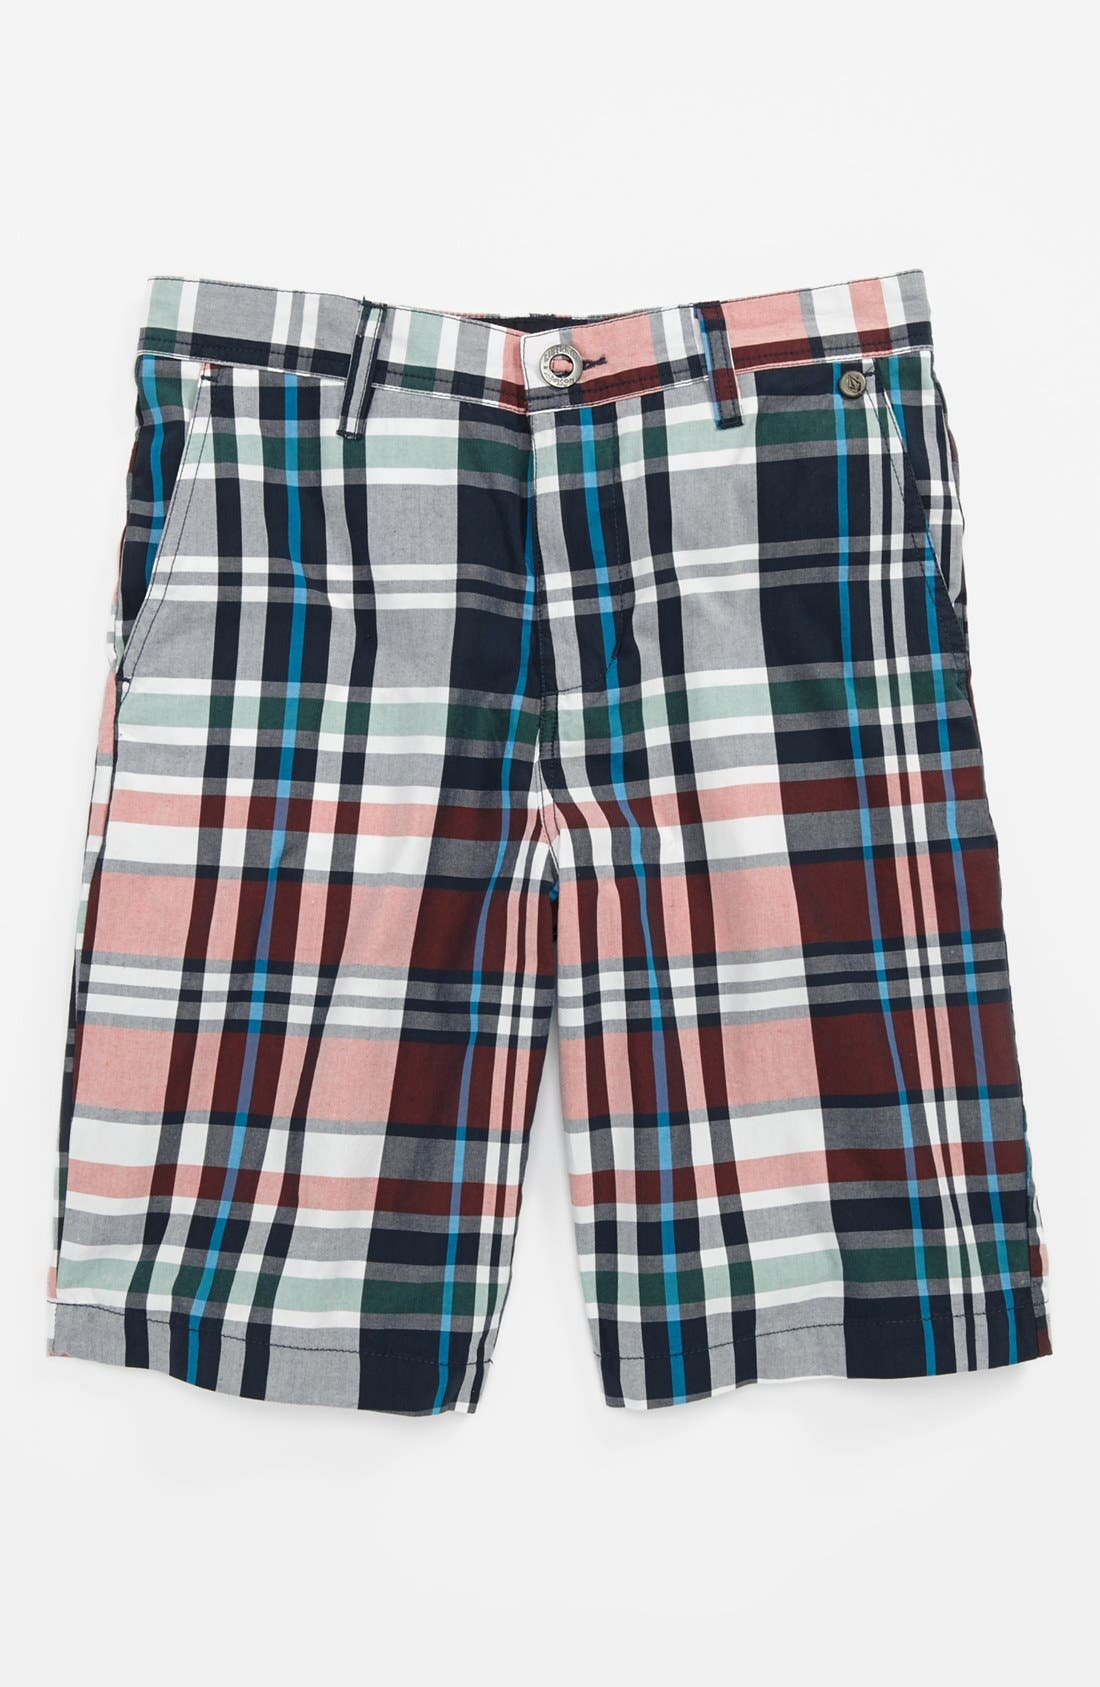 Alternate Image 1 Selected - Volcom 'Adit' Plaid Shorts (Little Boys & Big Boys)